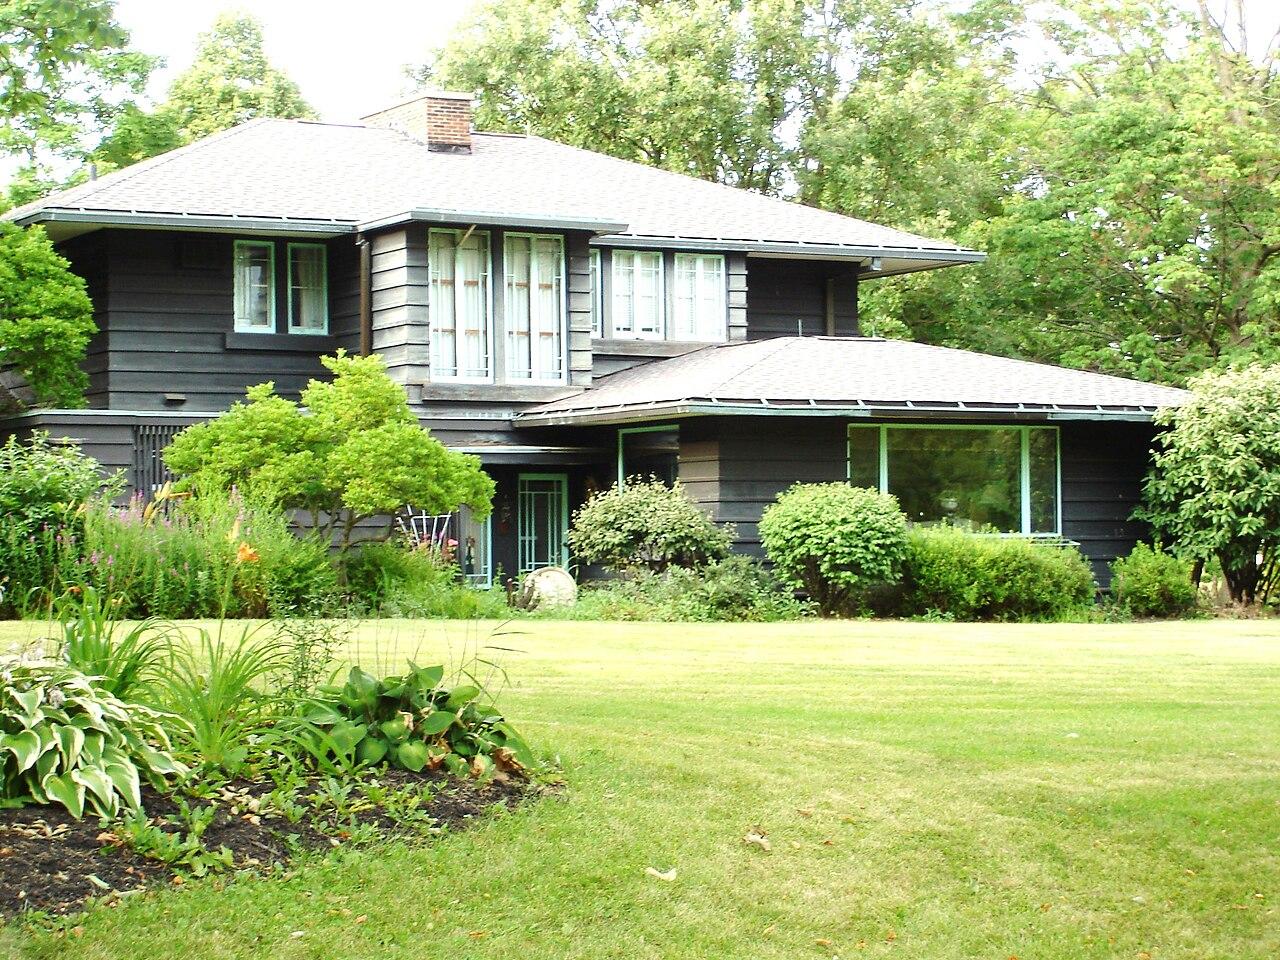 Frank Lloyd Wright Prairie Houses file:frank lloyd wright prairie style marysville - wikimedia